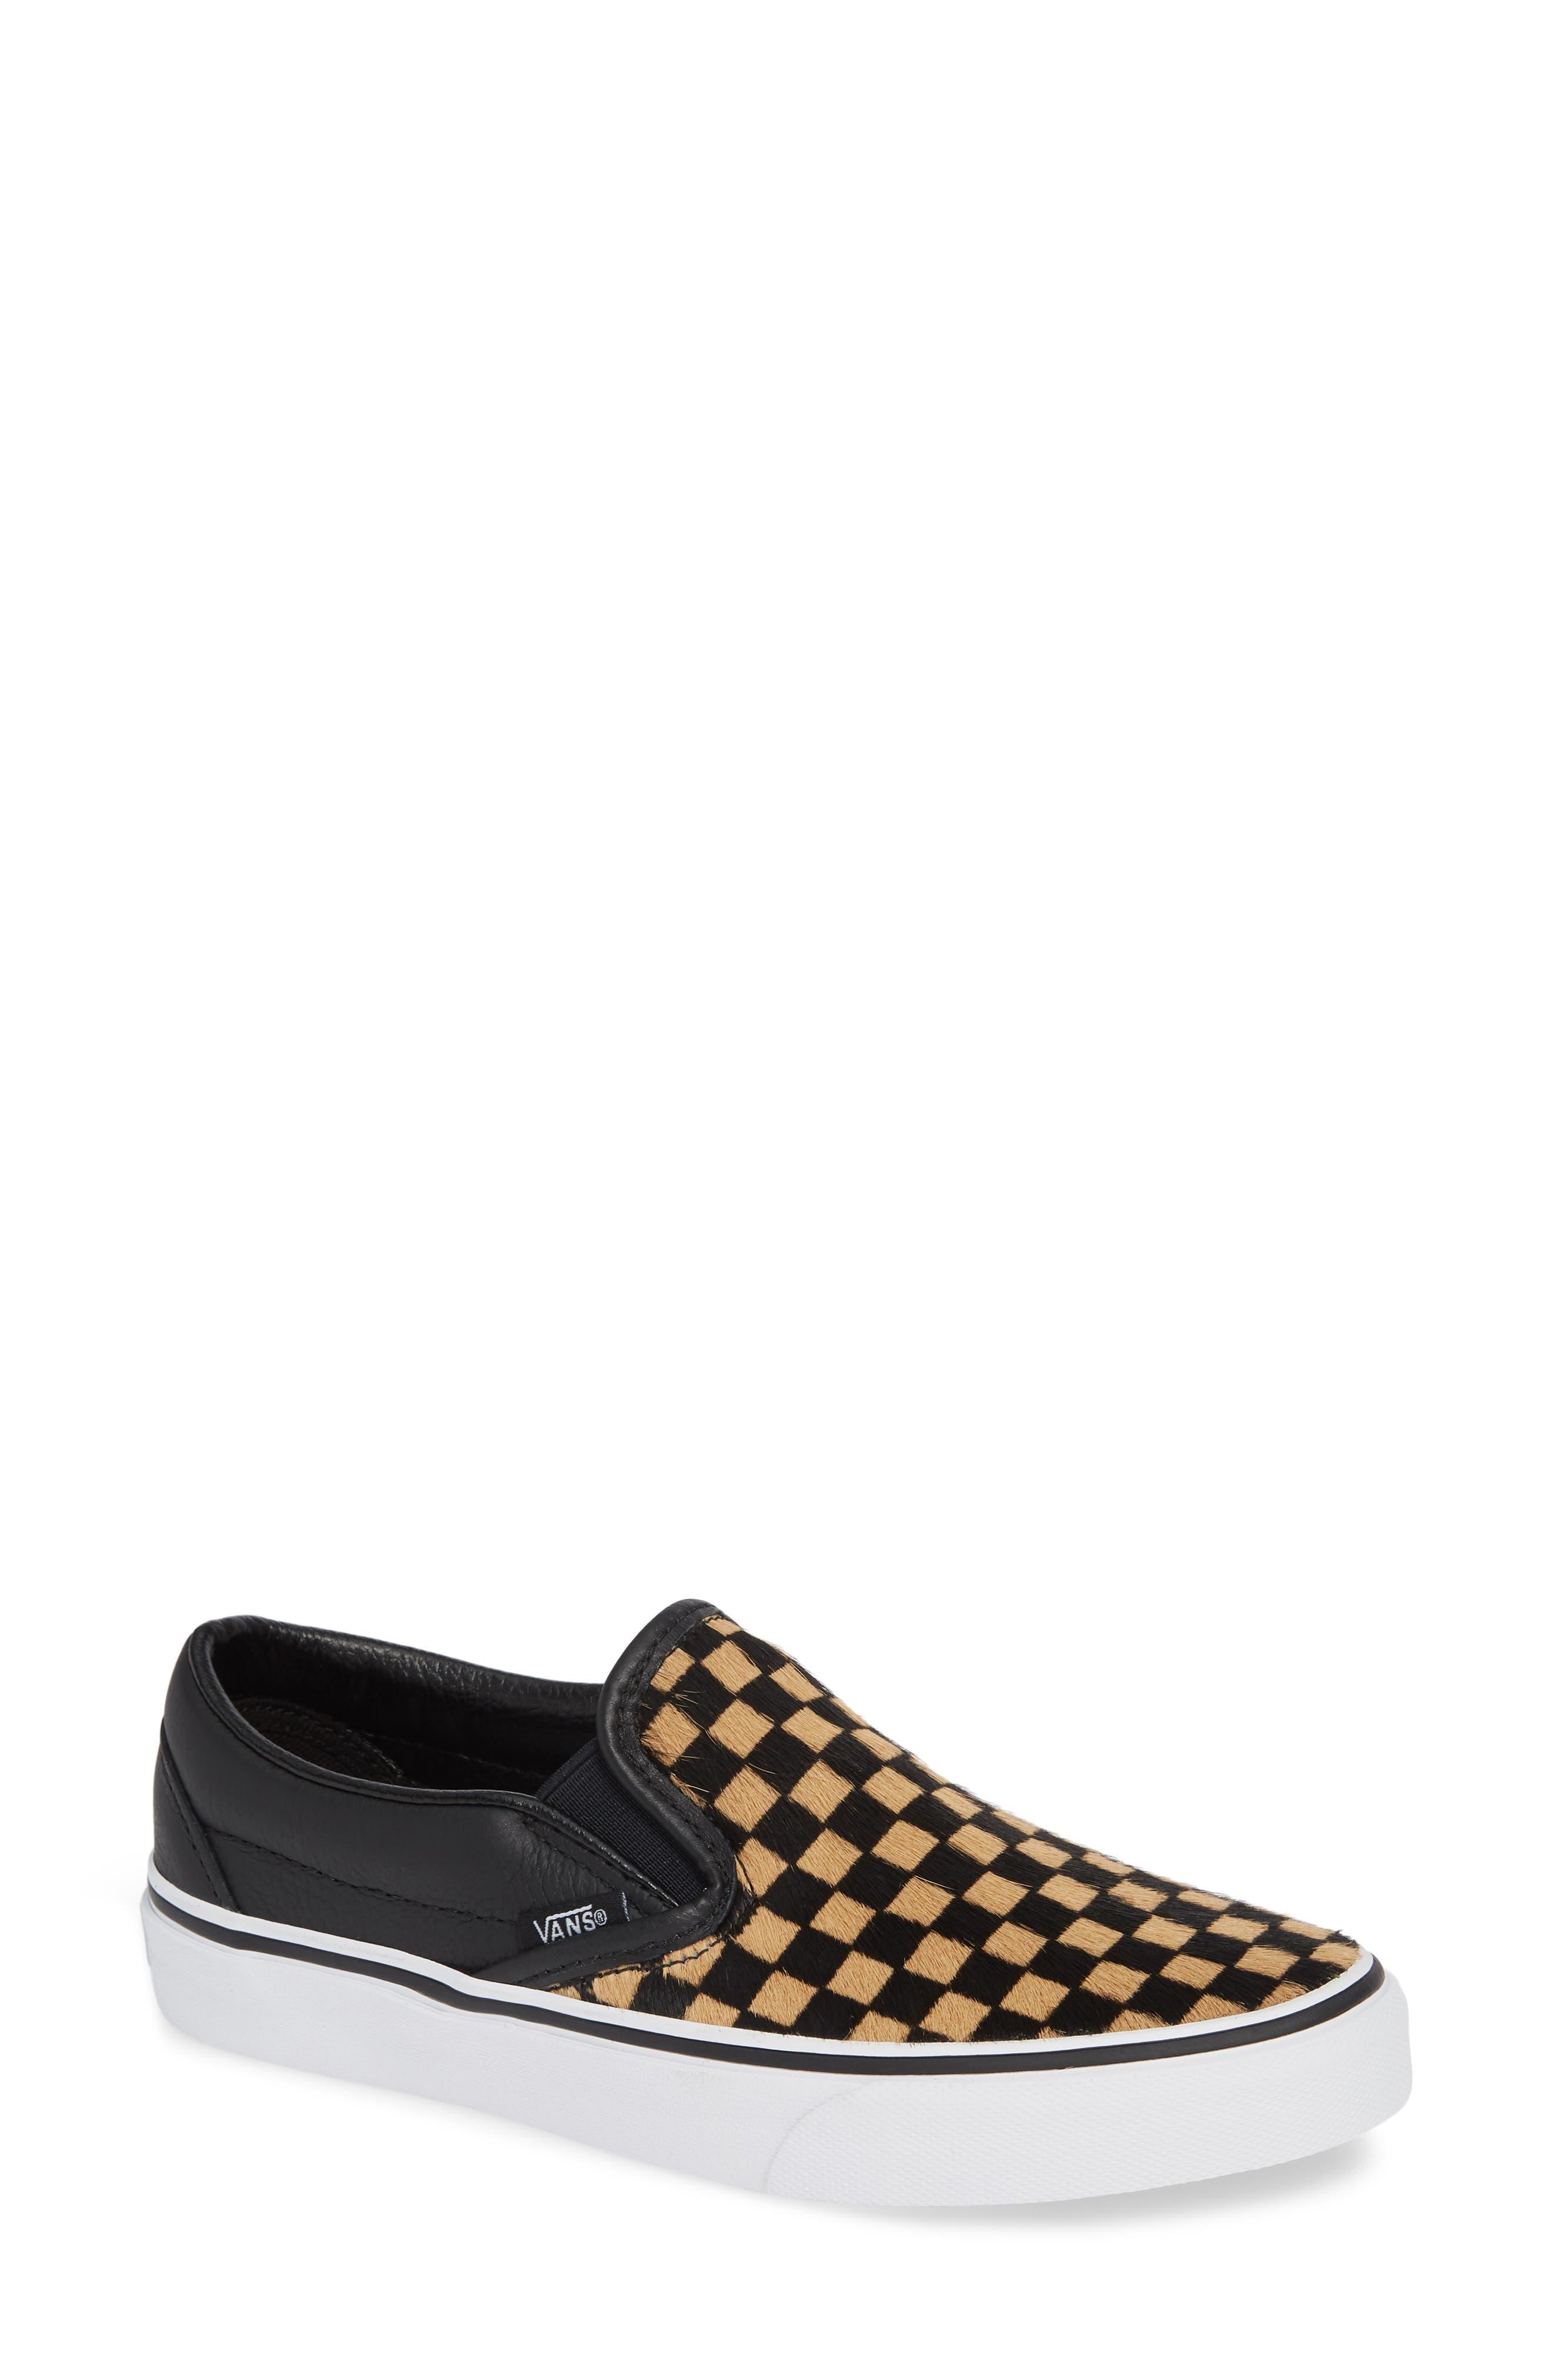 VANS UA Classic Genuine Calf Hair Slip-On Sneaker, Main, color, 001